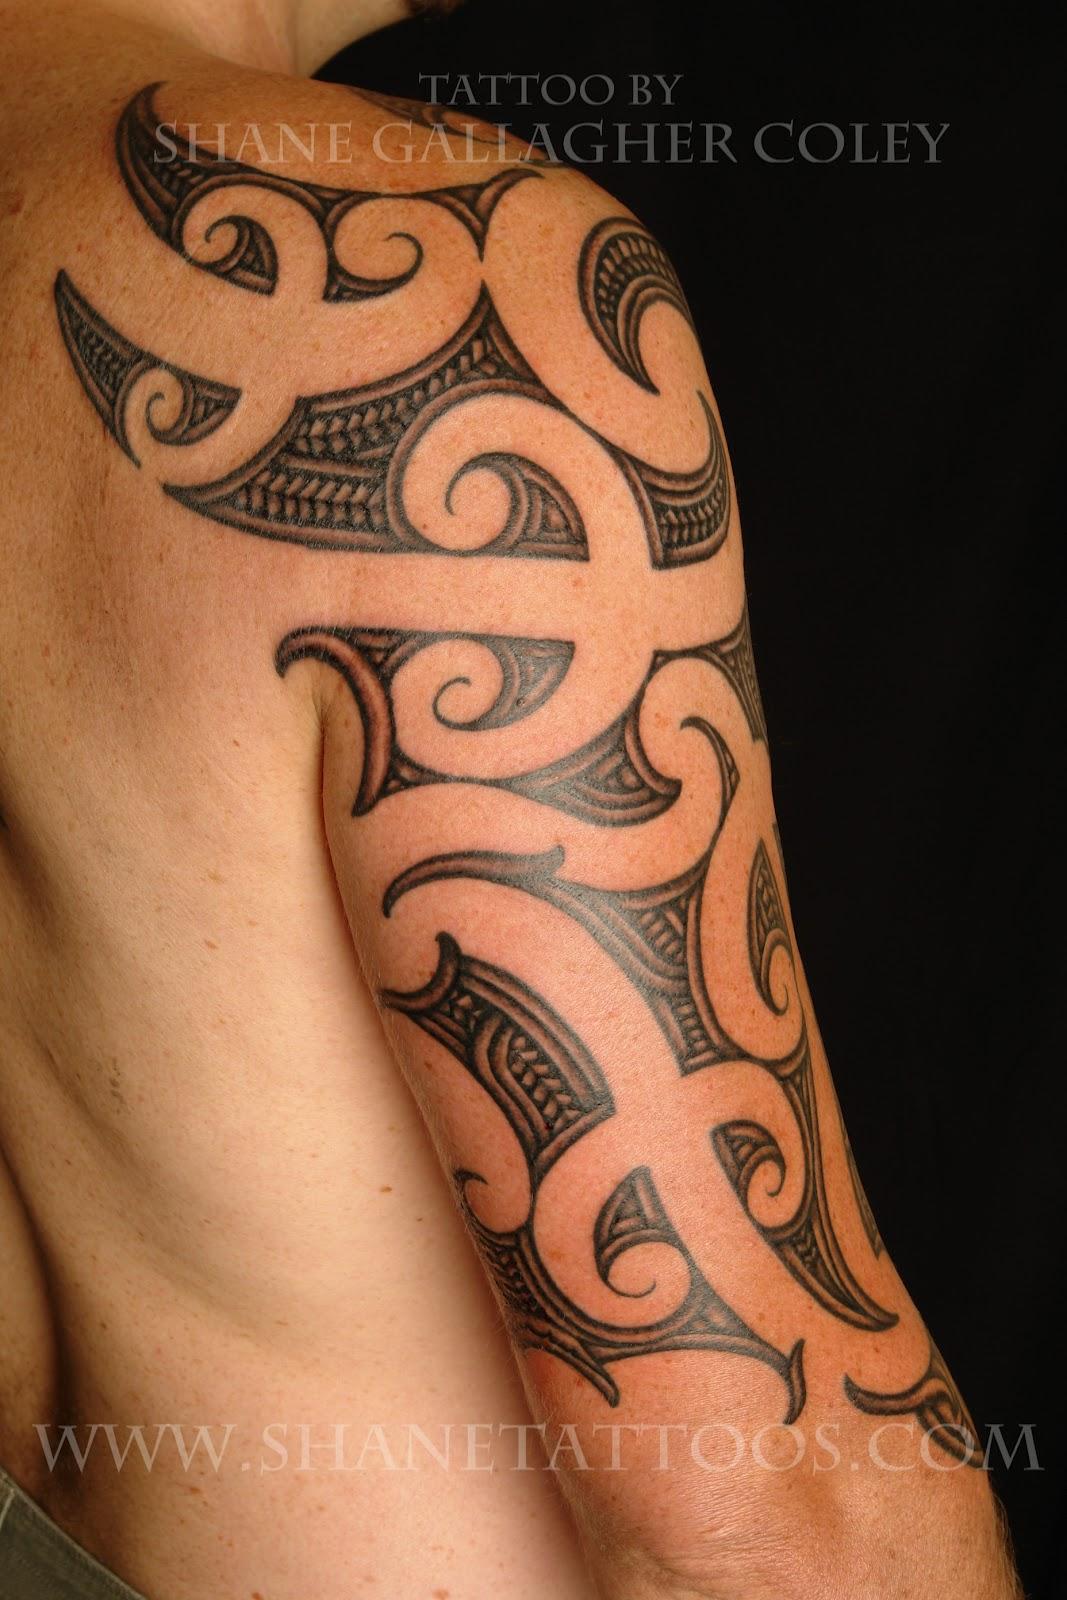 Maori polynesian tattoo maori sleeve tattoo for 1 4 sleeve tattoo